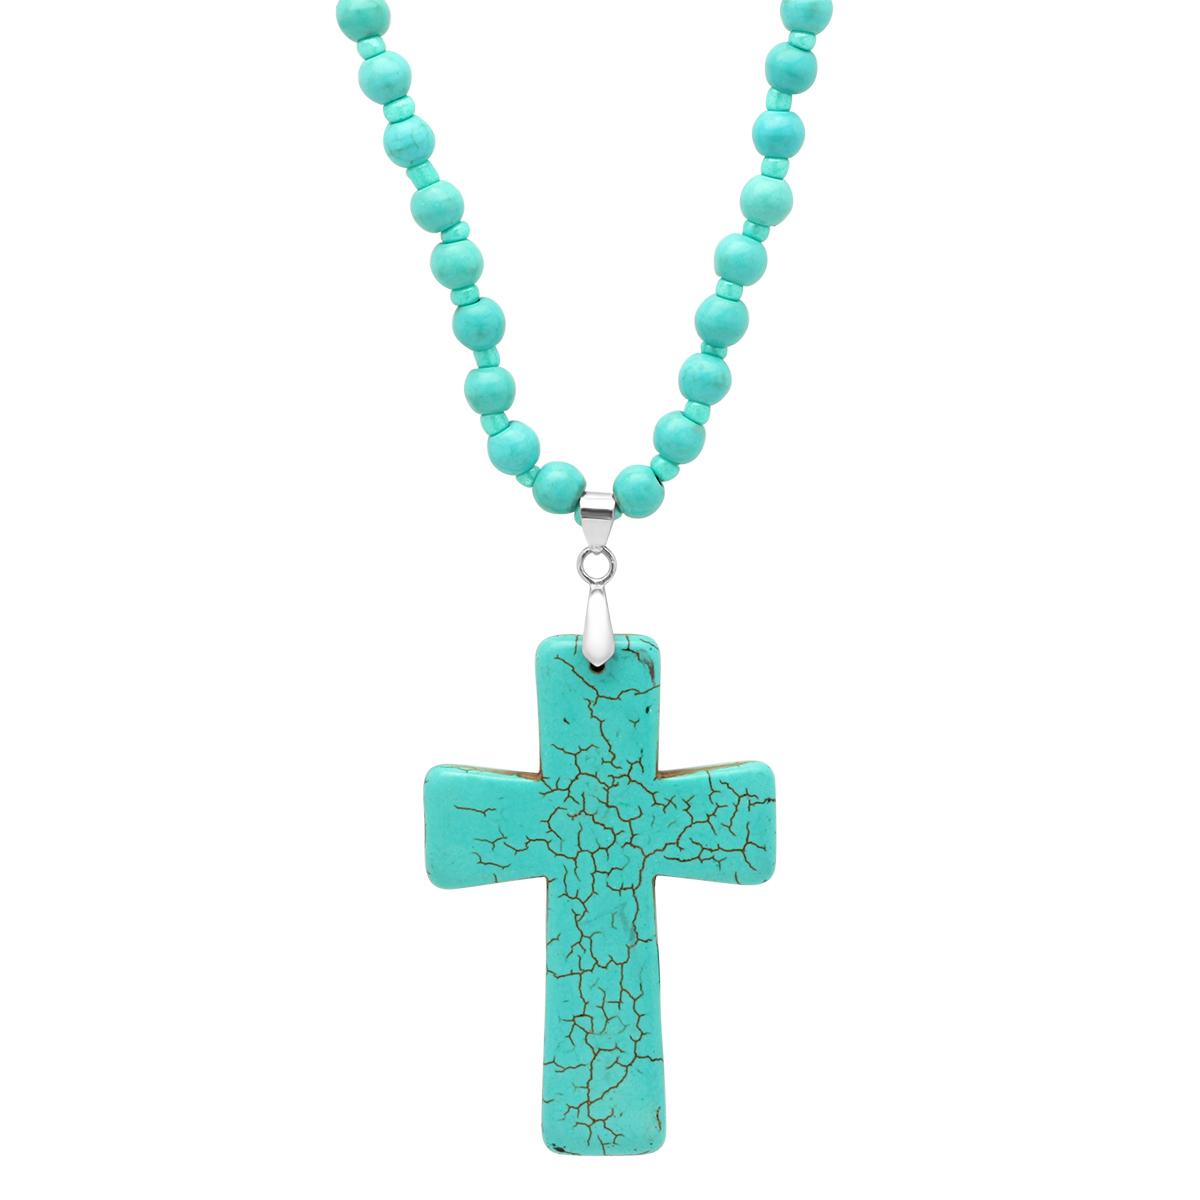 Genuine Turquoise Cross Necklace 5516202